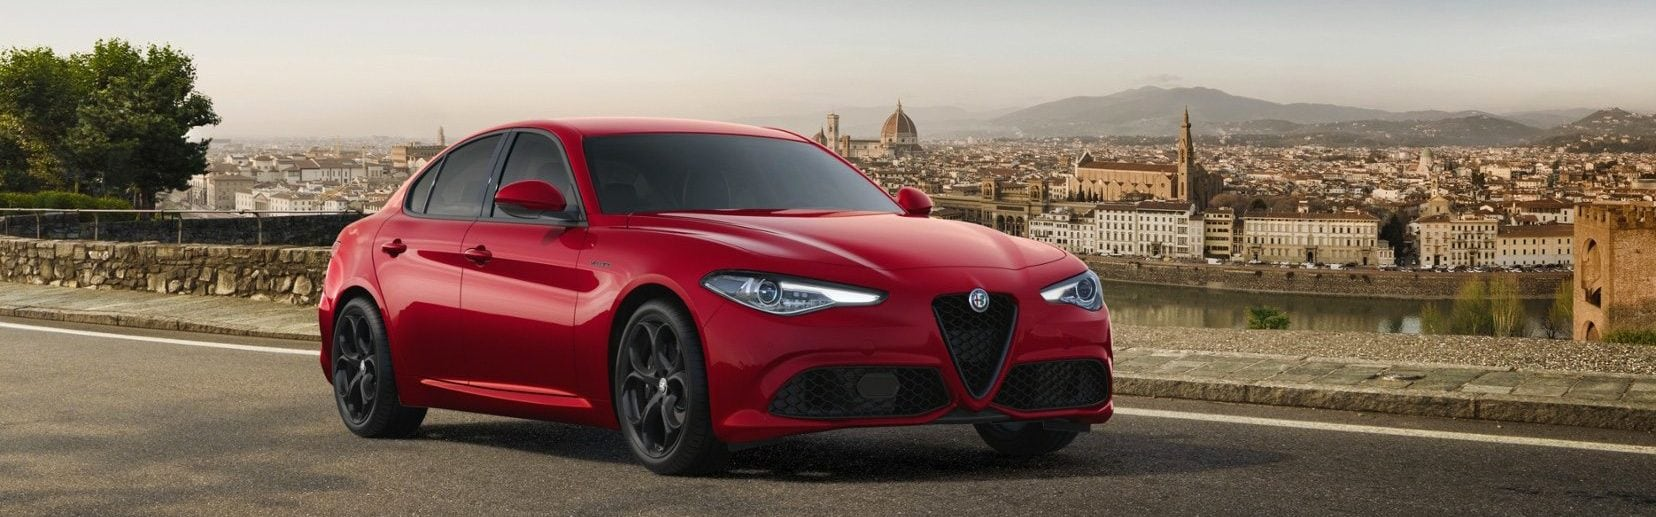 Alfa Romeo Giulia - Concessionari Caserta